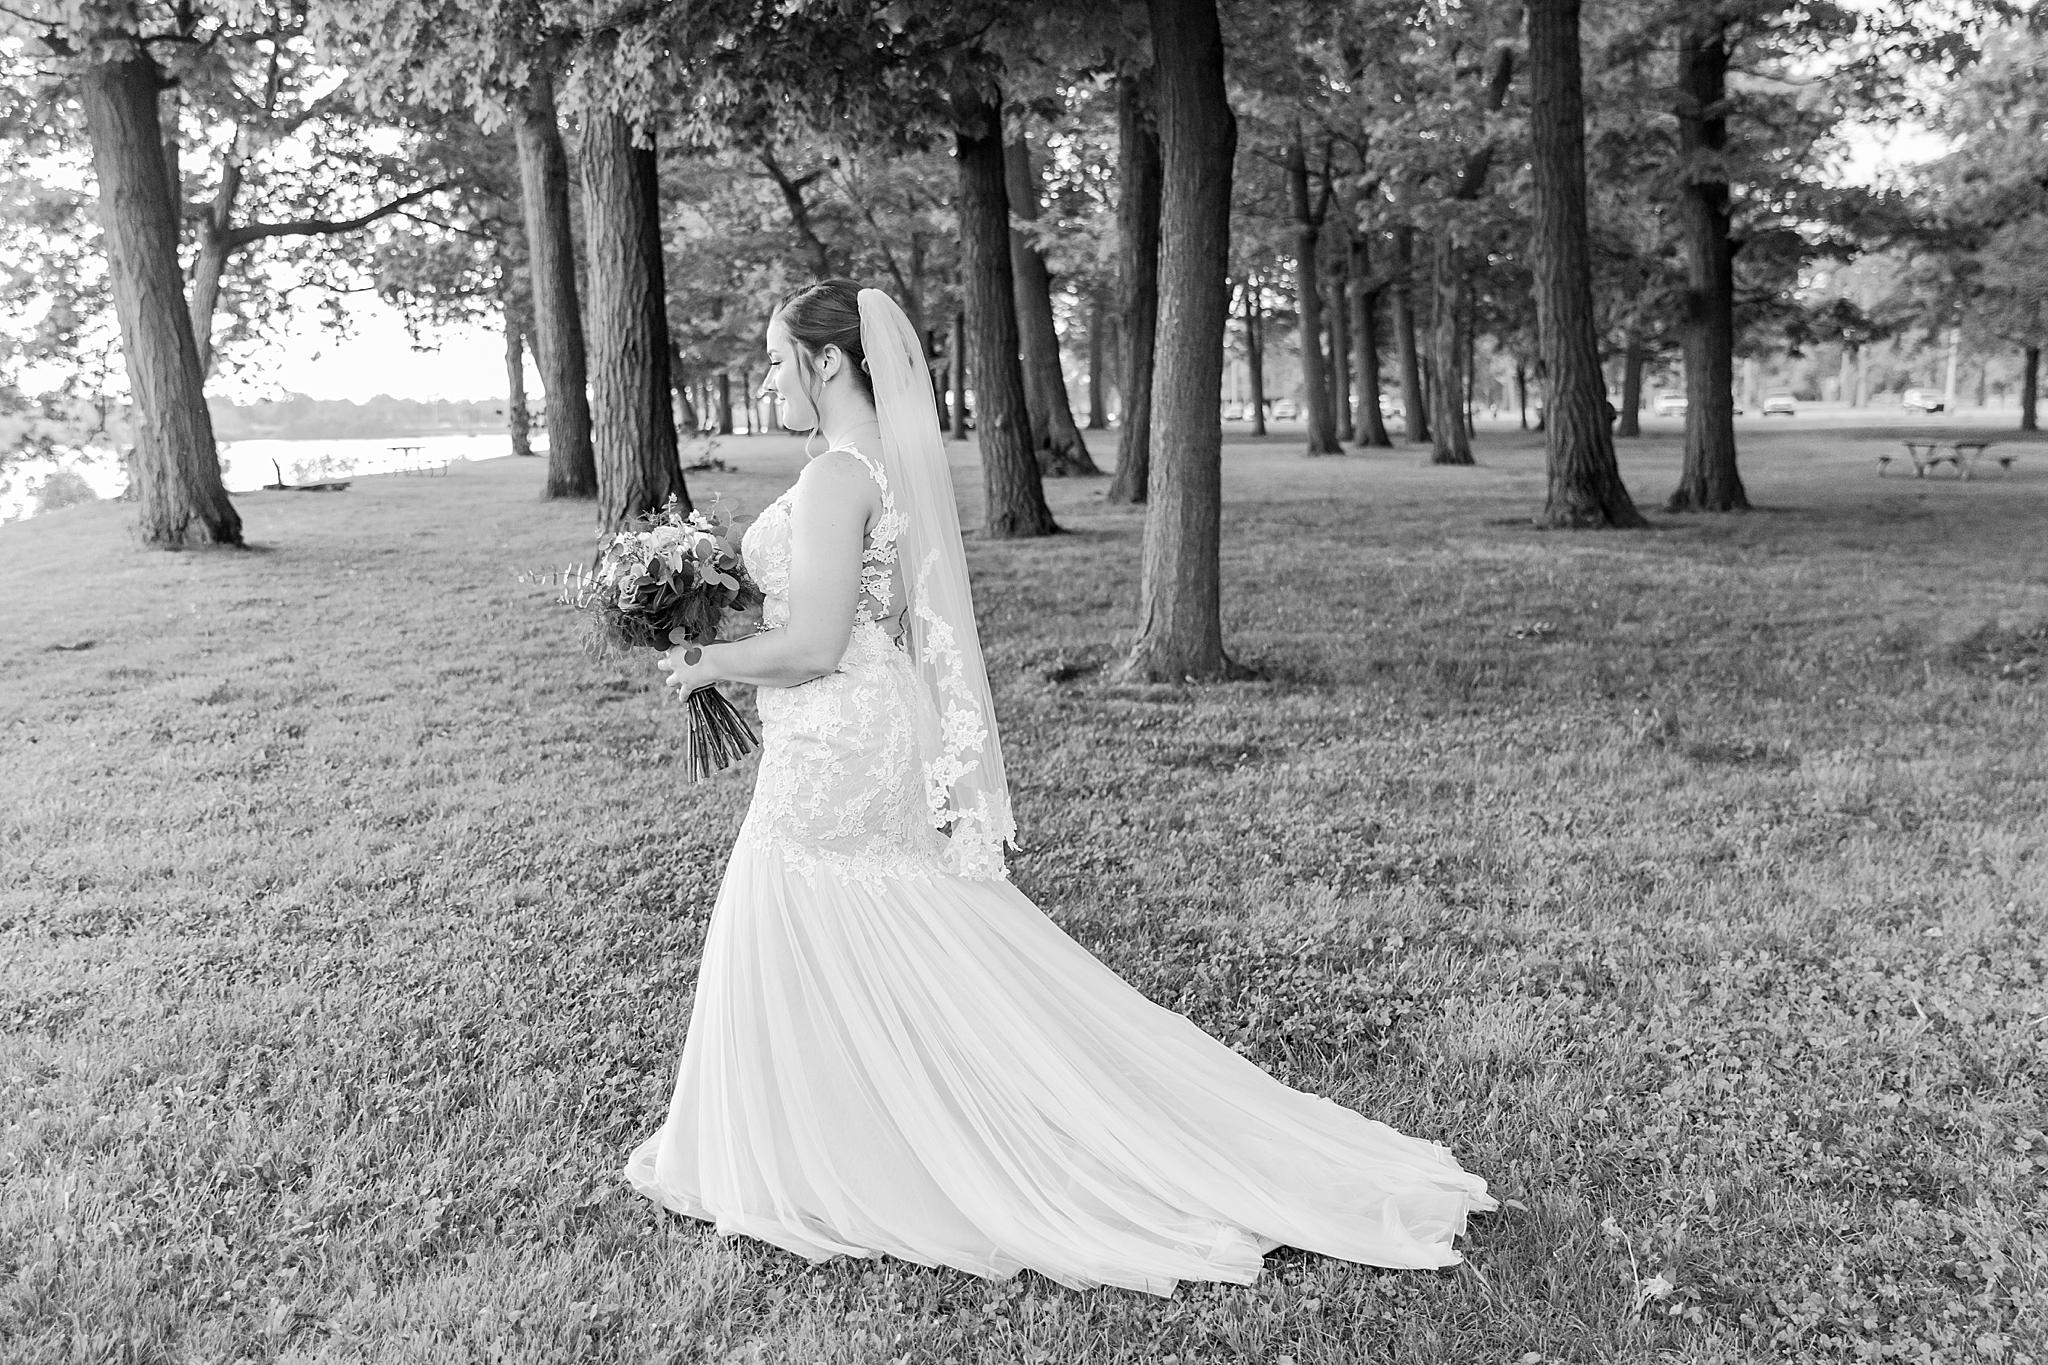 detroit-wedding-photographer-brownstown-event-center-wedding-photos-sam-josh-by-courtney-carolyn-photography_0025.jpg